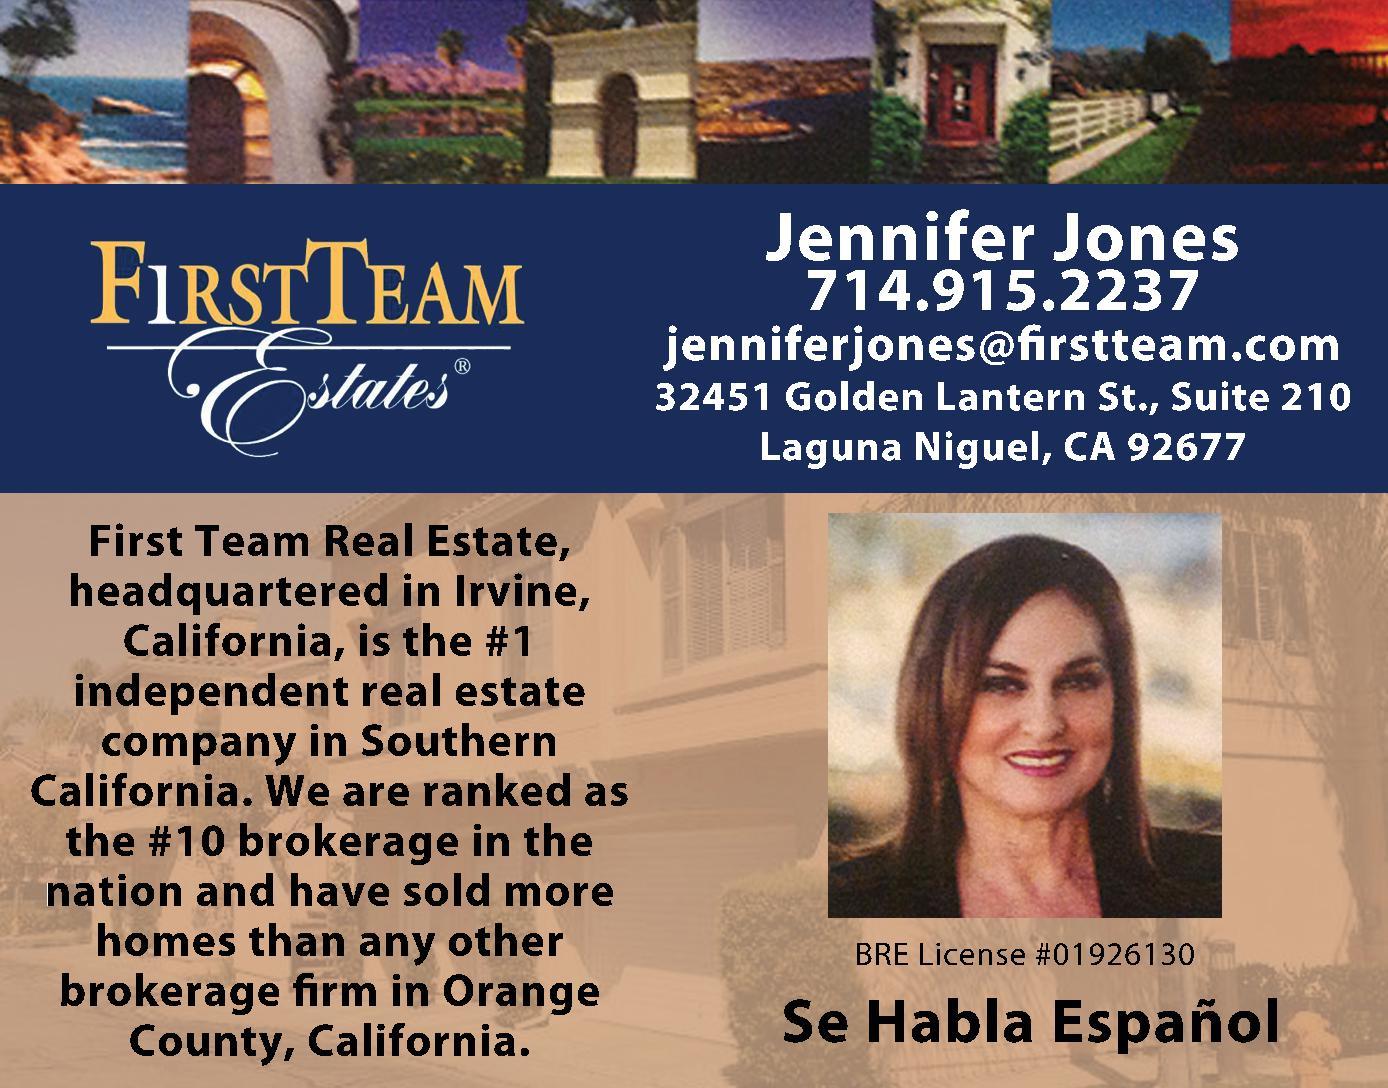 First Team Estates - Jones